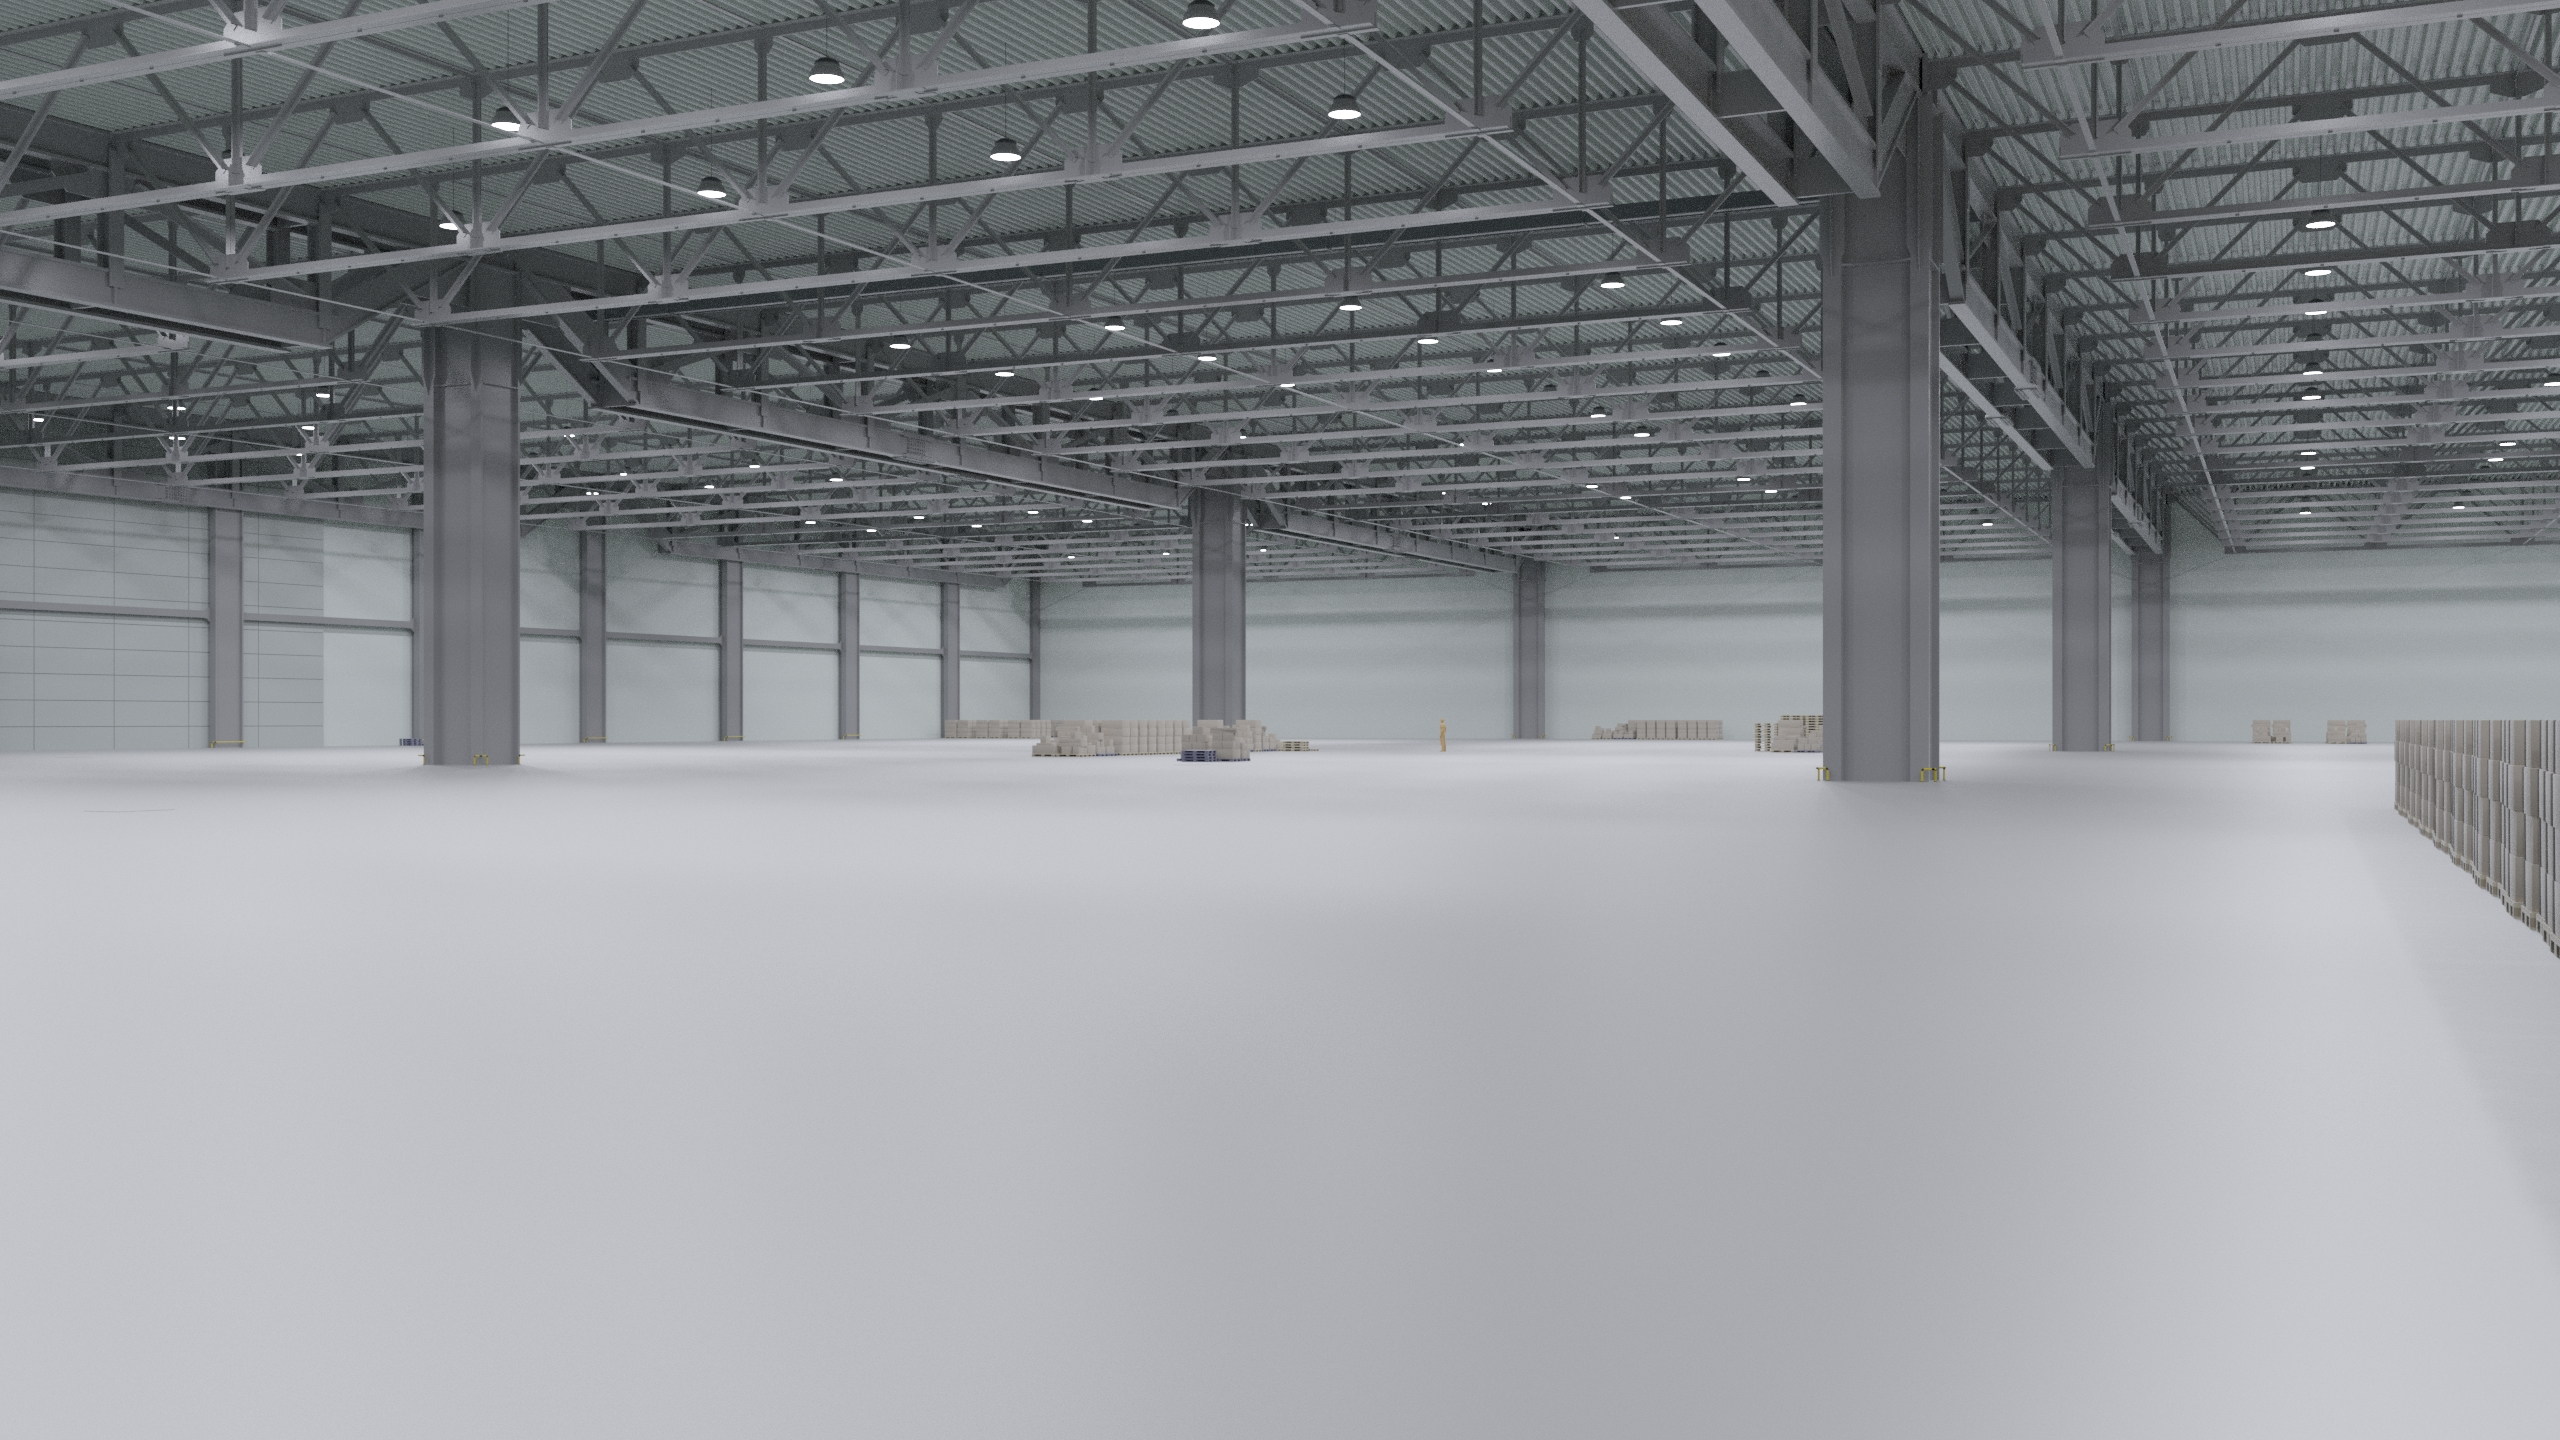 Beau Warehouse Interior 3